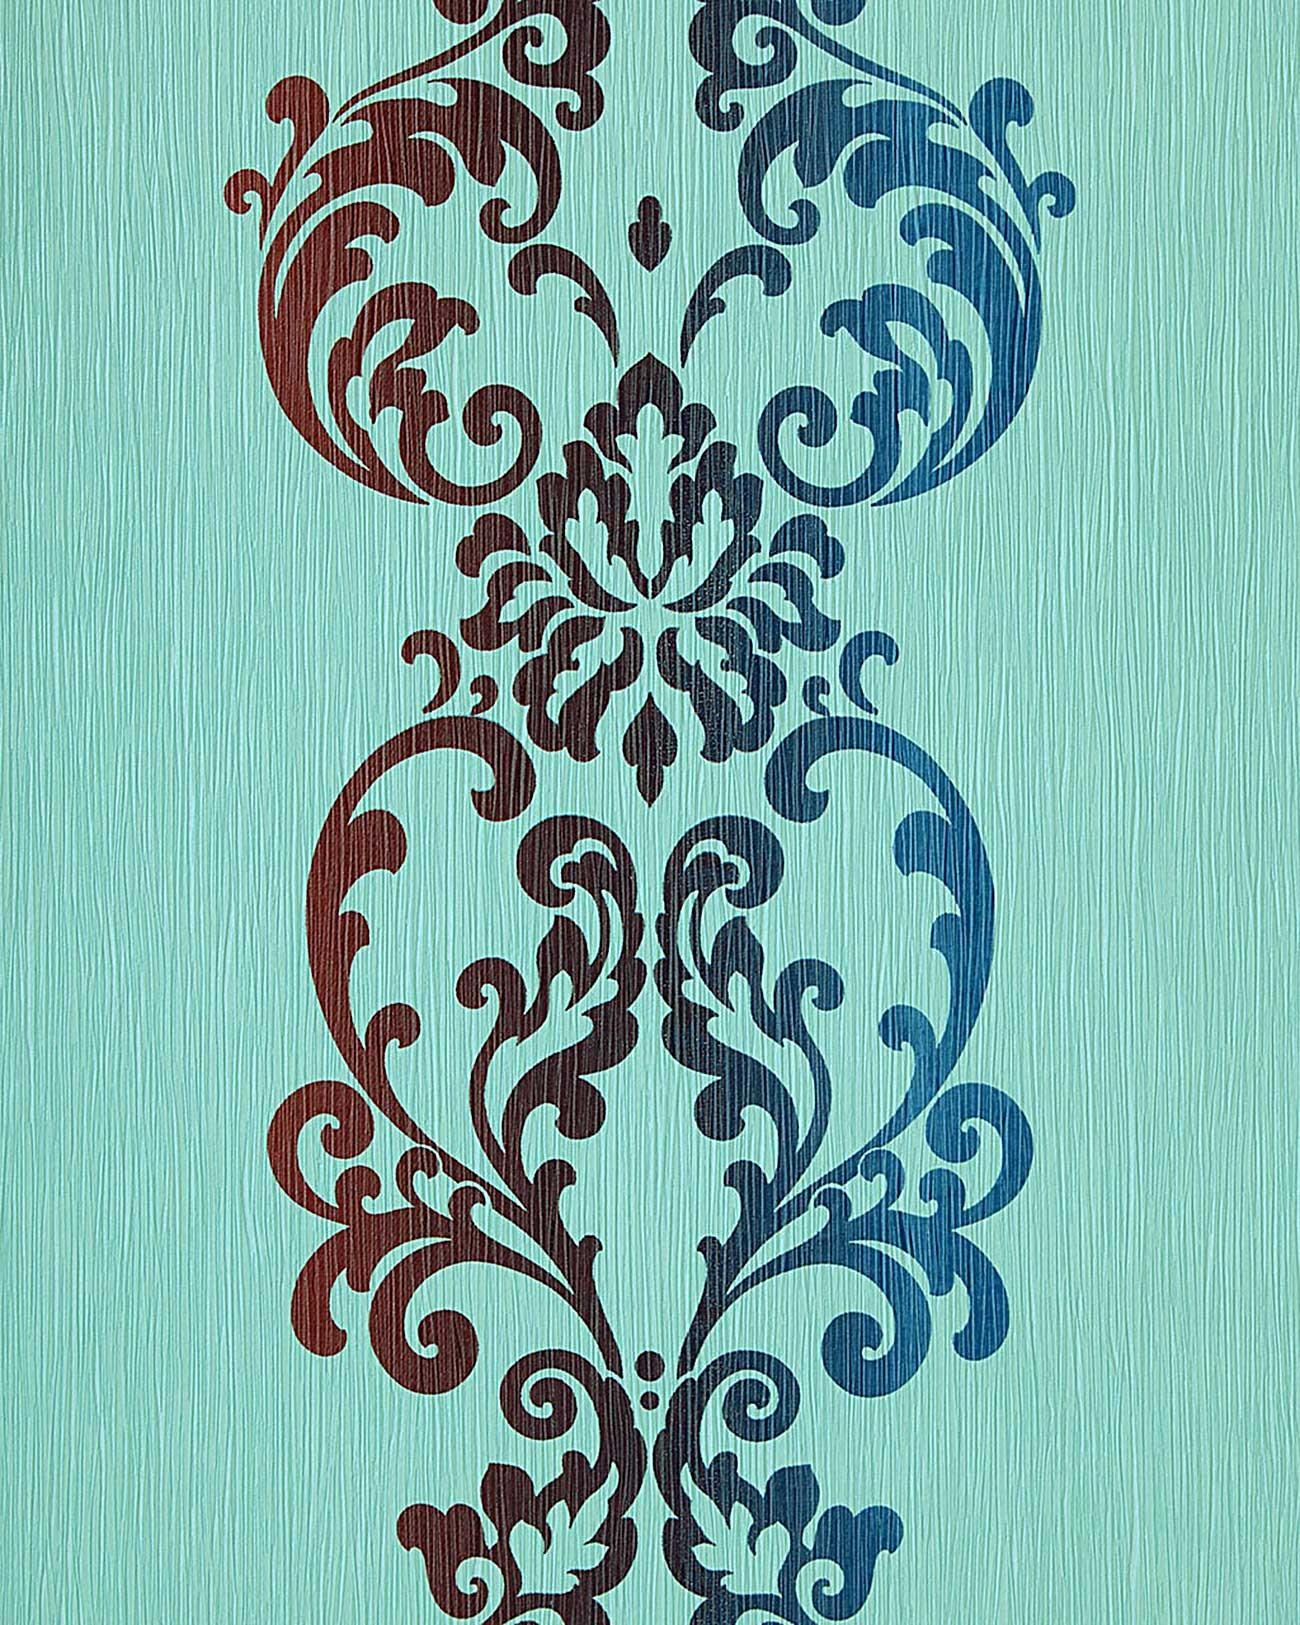 Barock Tapete Edem 178 26 Tapete Modern Art Ornamente Hell Turkis Blau Braun Perlmutt Kaufen Bei E Delux Gmbh